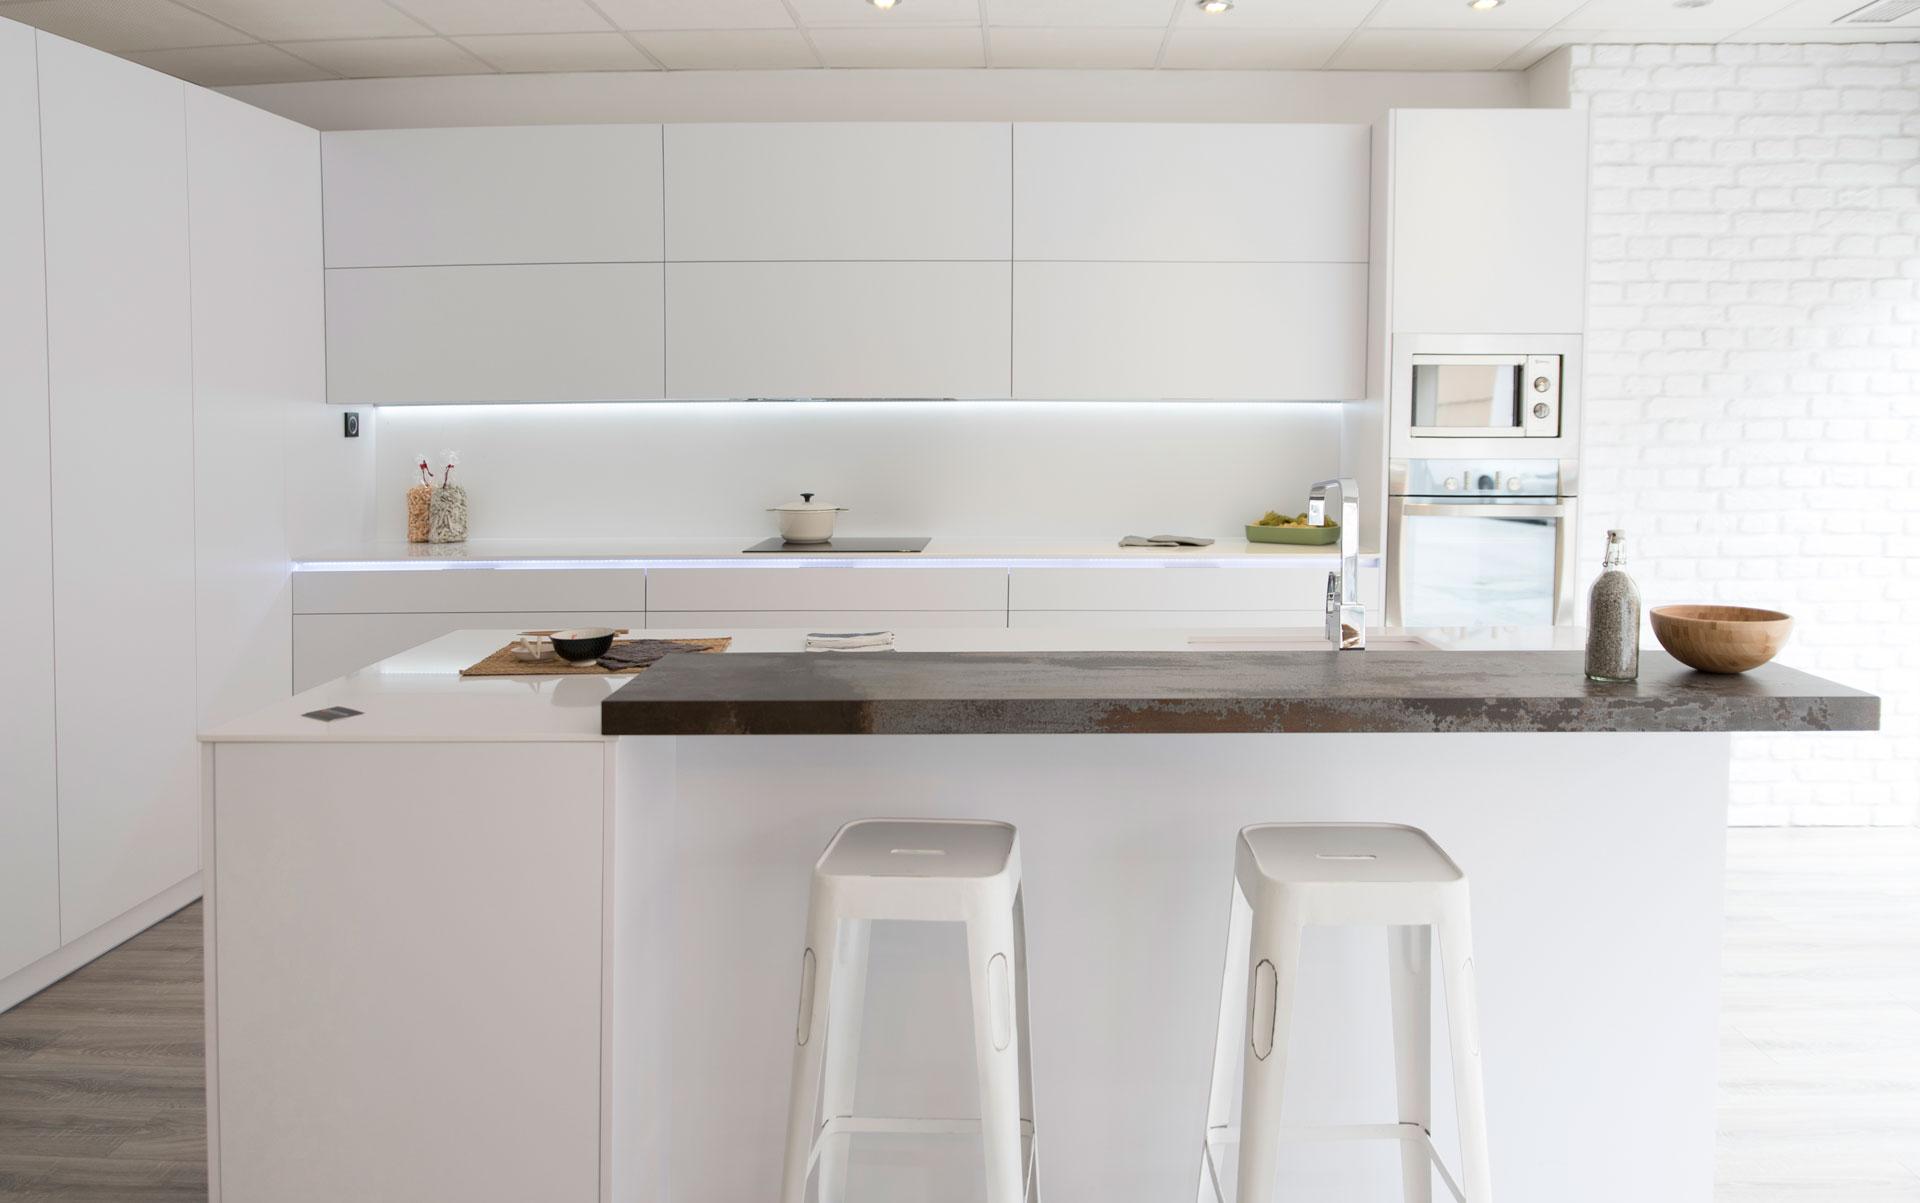 Muebles para la cocina sin tiradores arcomobel - Cocina sin tiradores ...